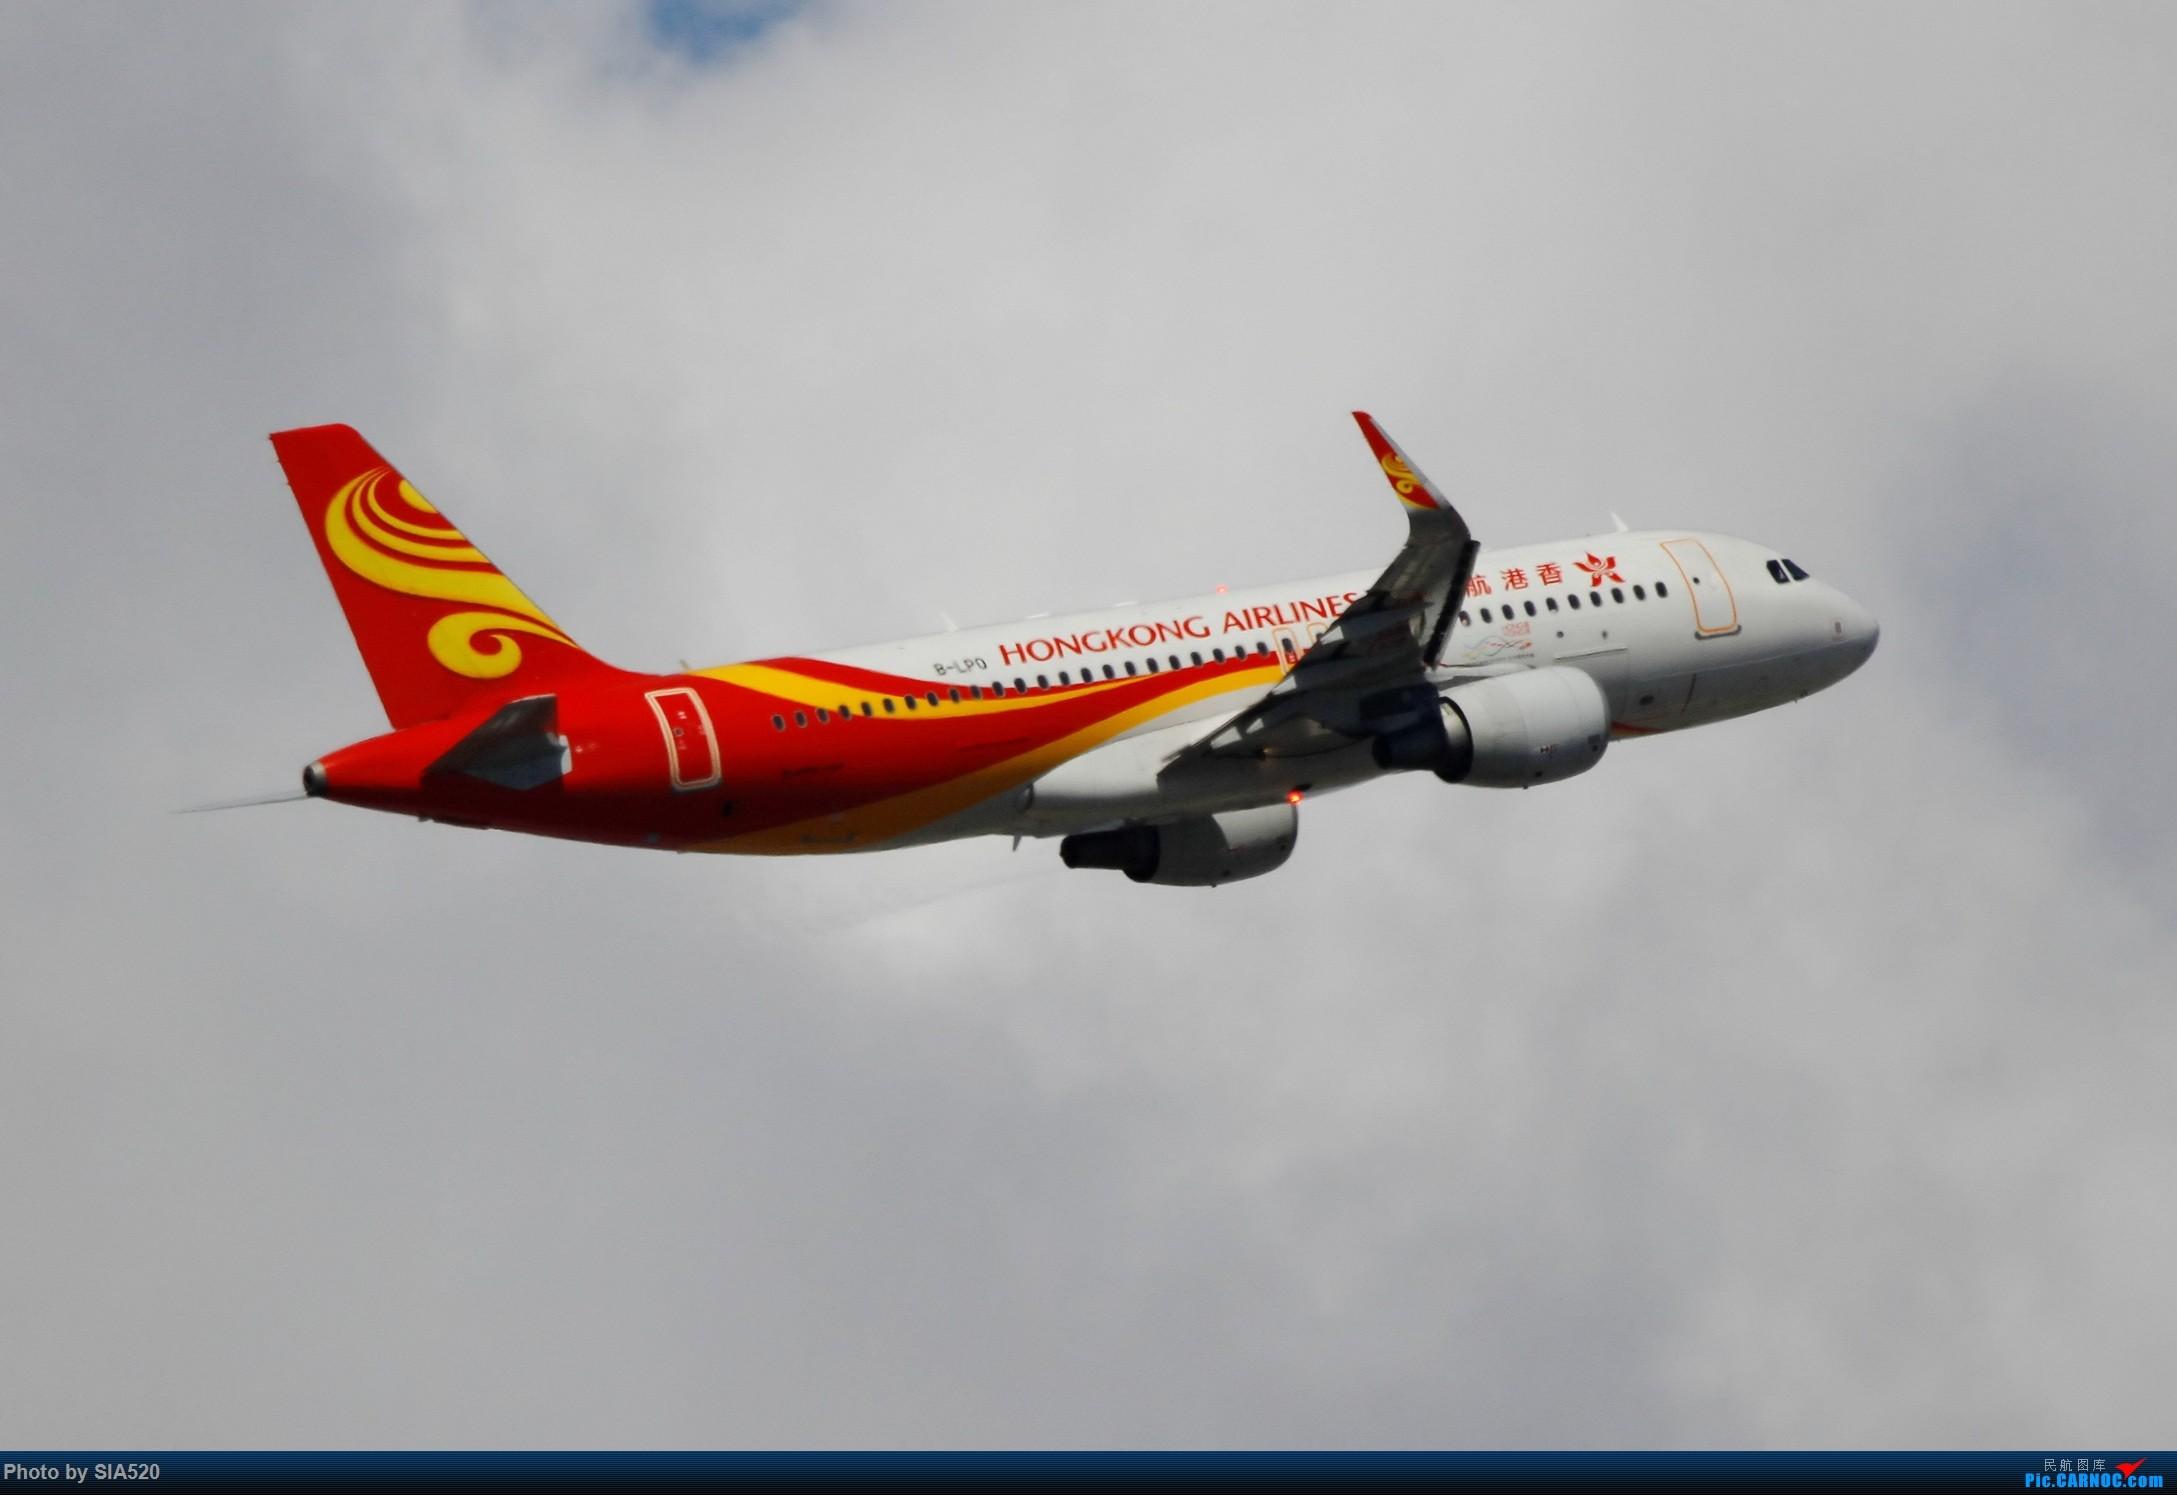 Re:[原创]北京人儿在三亚—600mm解锁凤凰 AIRBUS A320-200 B-LPO 中国三亚凤凰国际机场